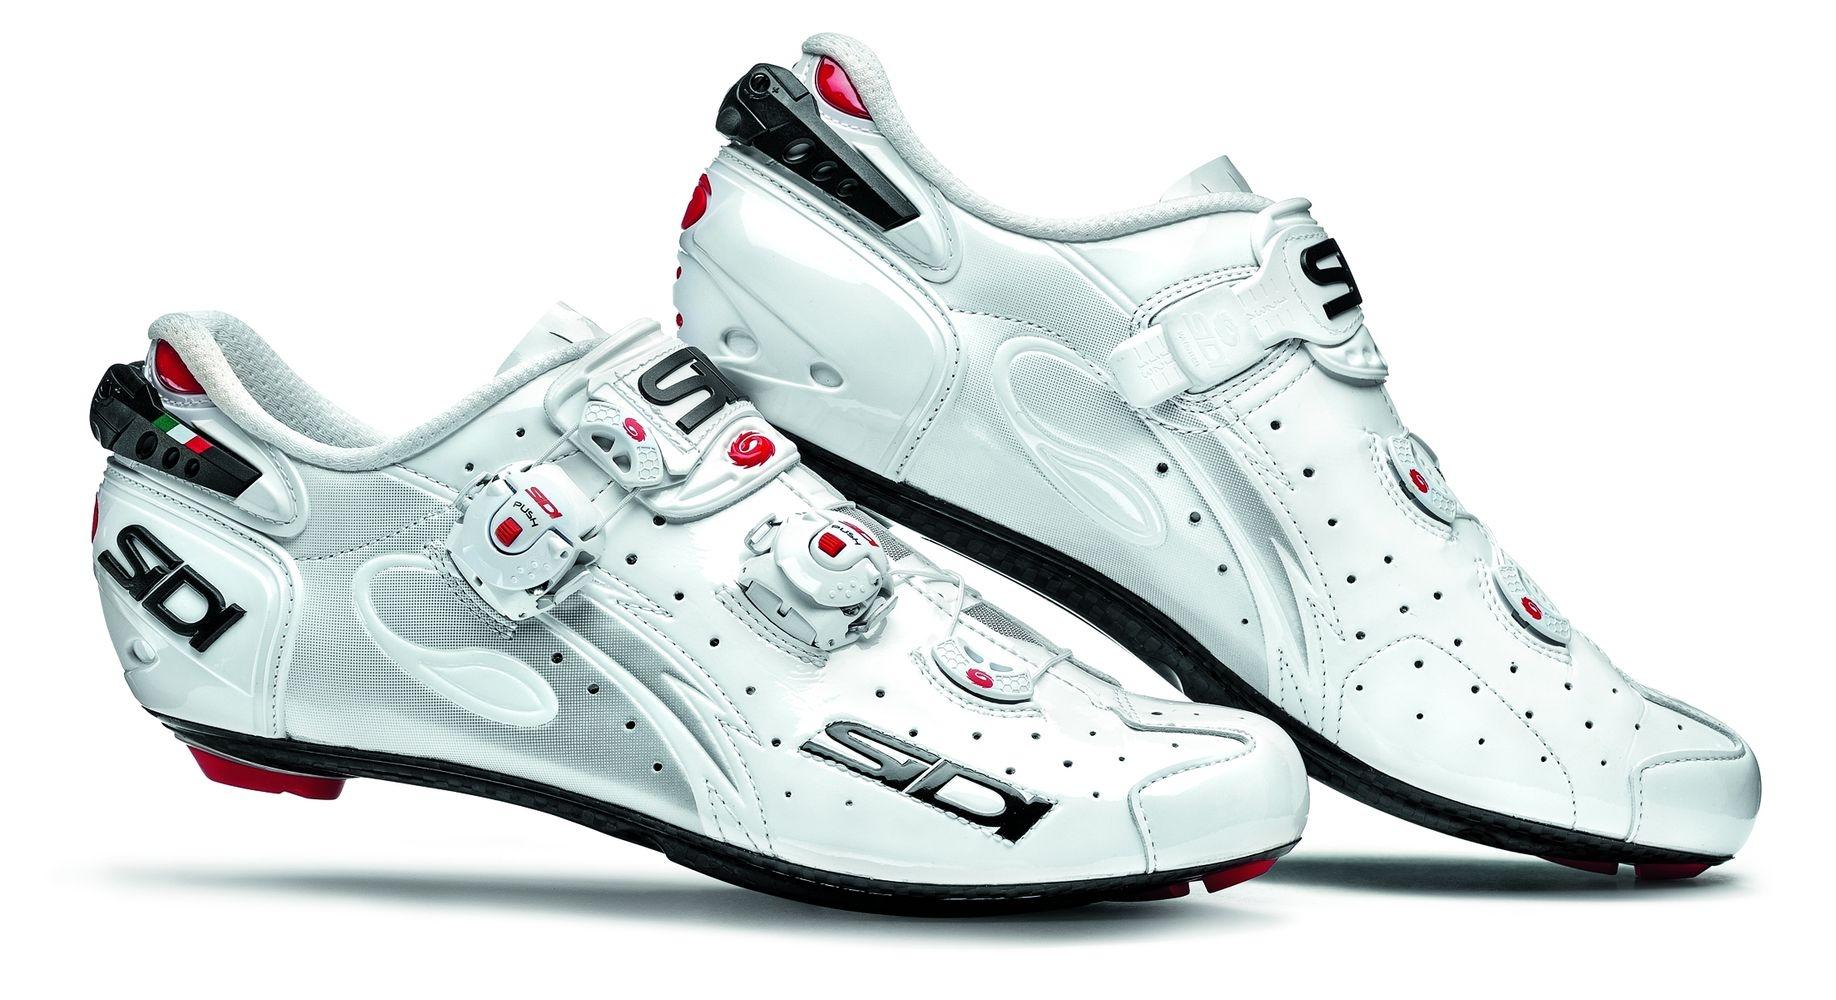 Chaussures Sidi WIRE Carbon Vernice Blanc verni - 42,5